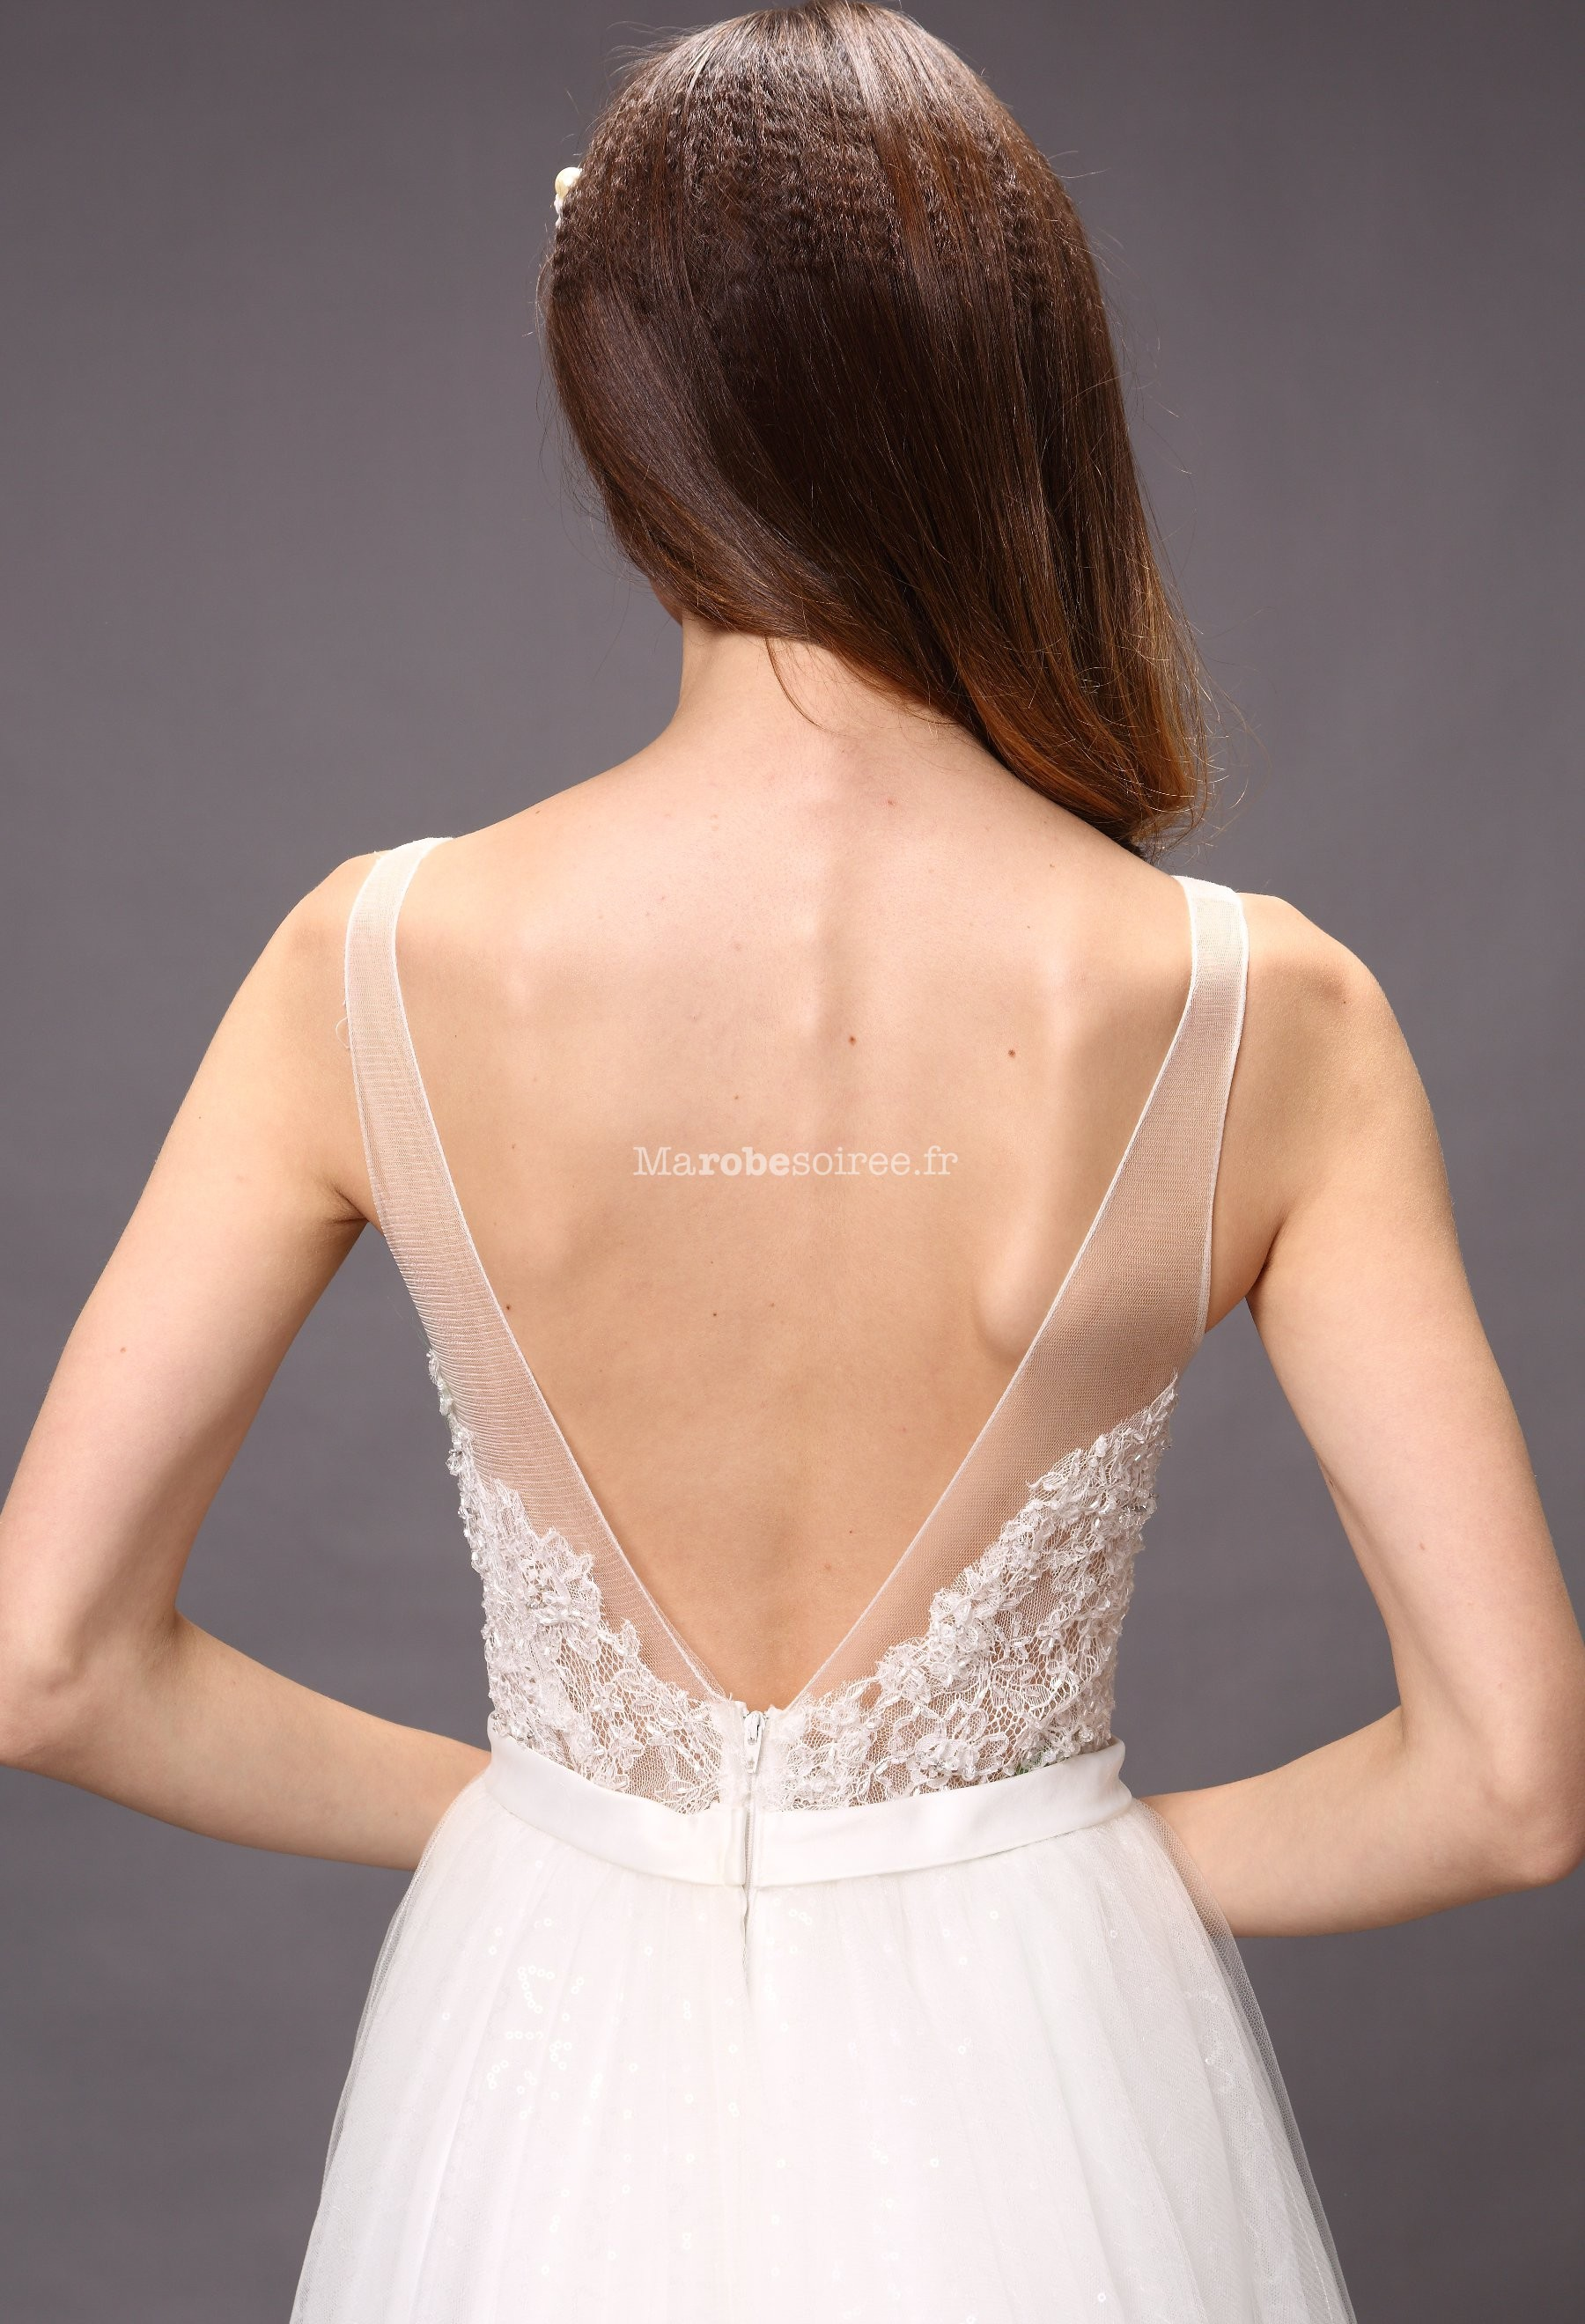 robe de mari e d collet chancr dans le dos. Black Bedroom Furniture Sets. Home Design Ideas